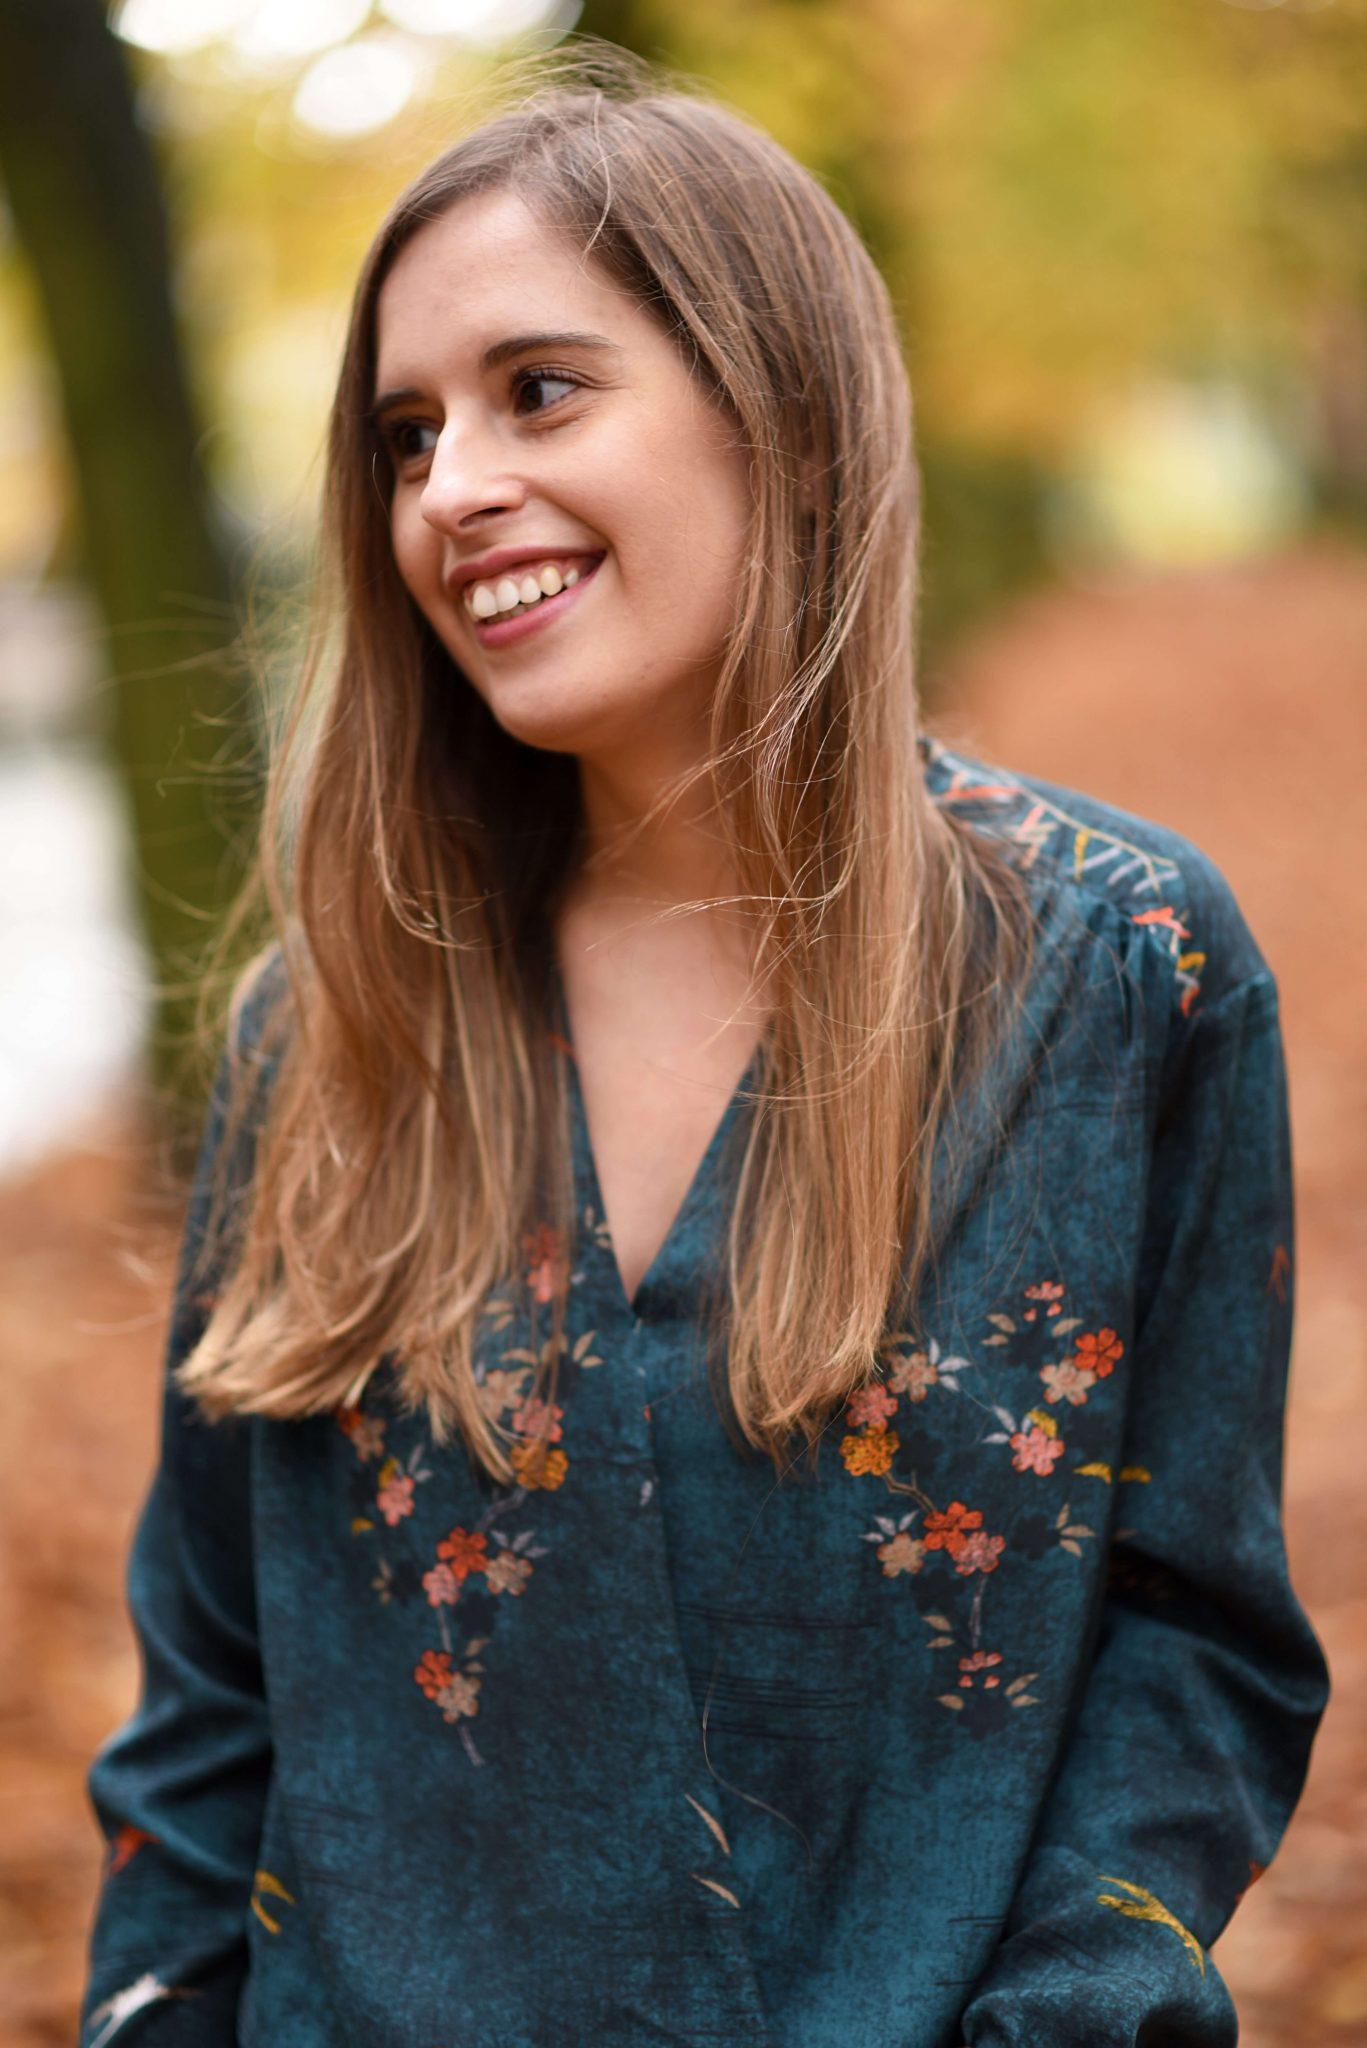 zara-blouse-body-aw16